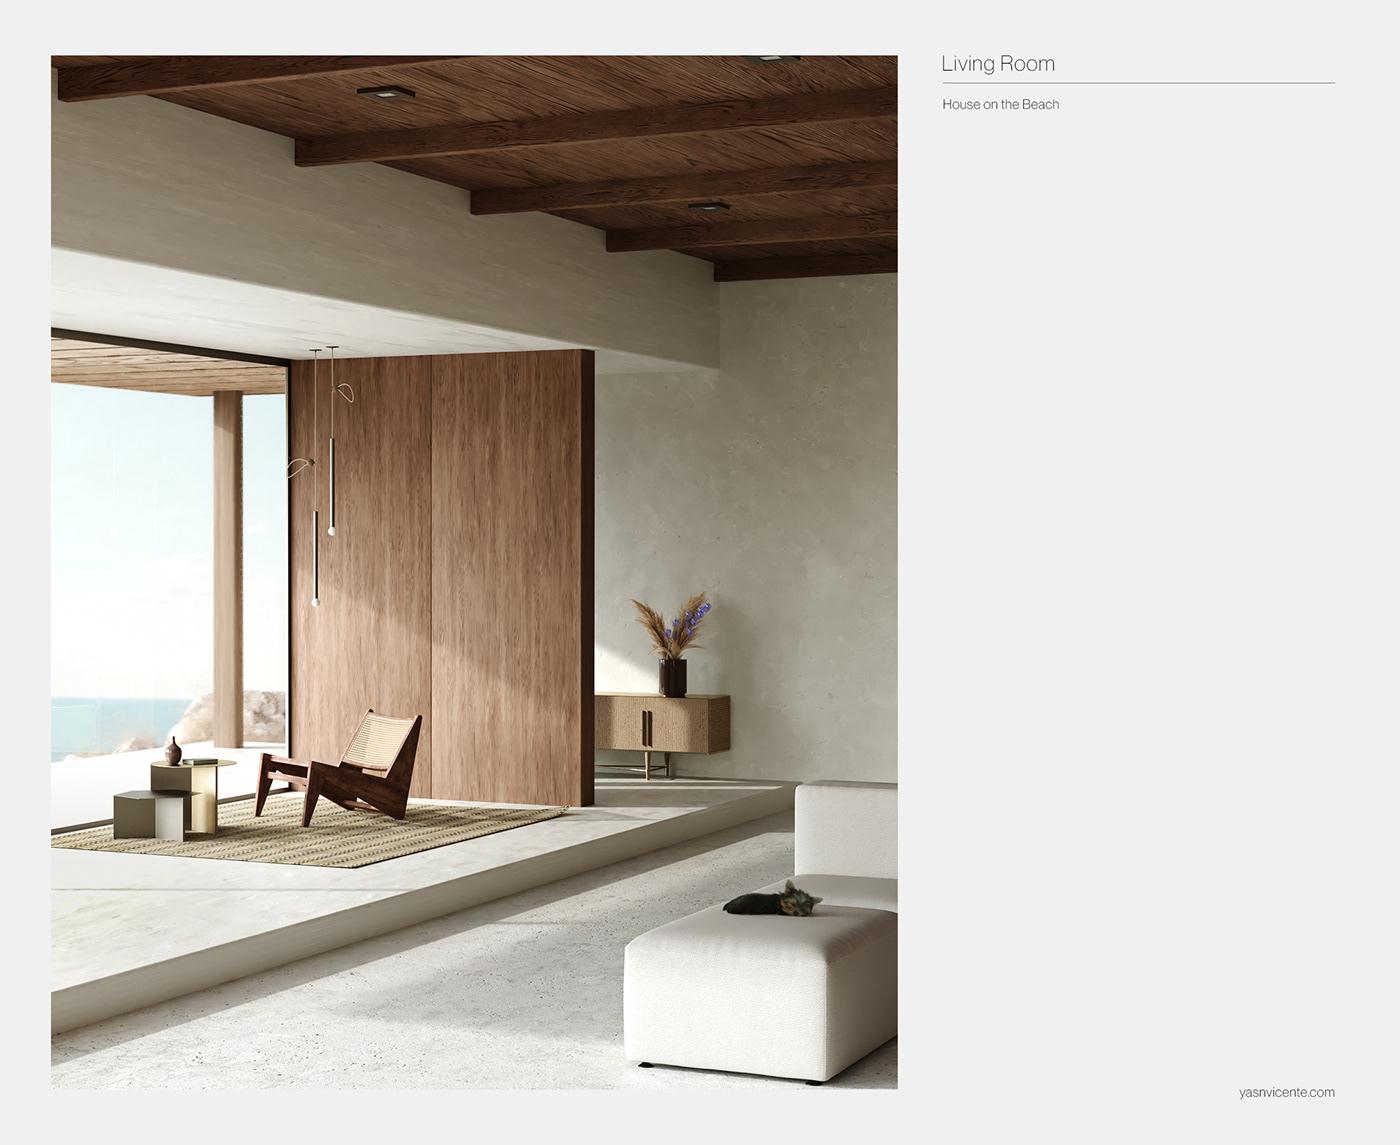 3D CGI design Dreamhouse house Interior Landscape Nature c4d interiordesign